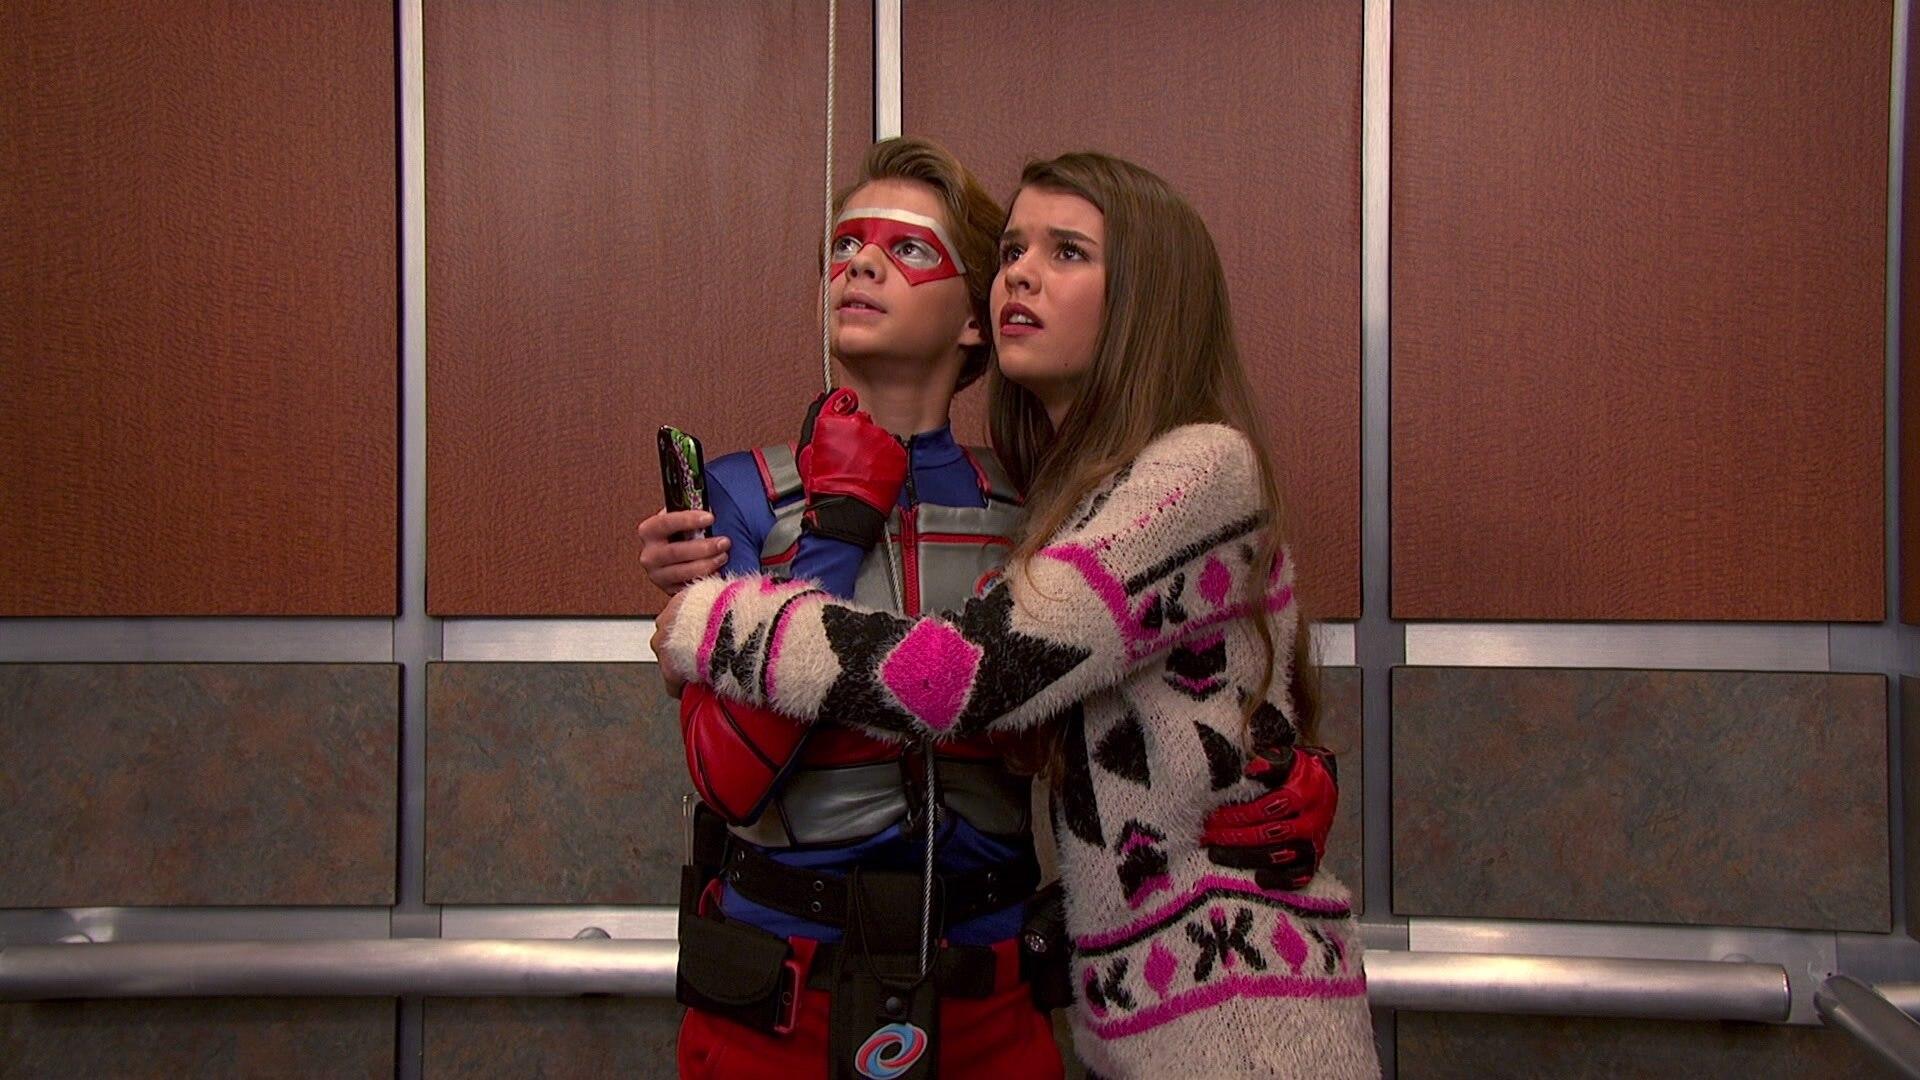 Elevator Kiss